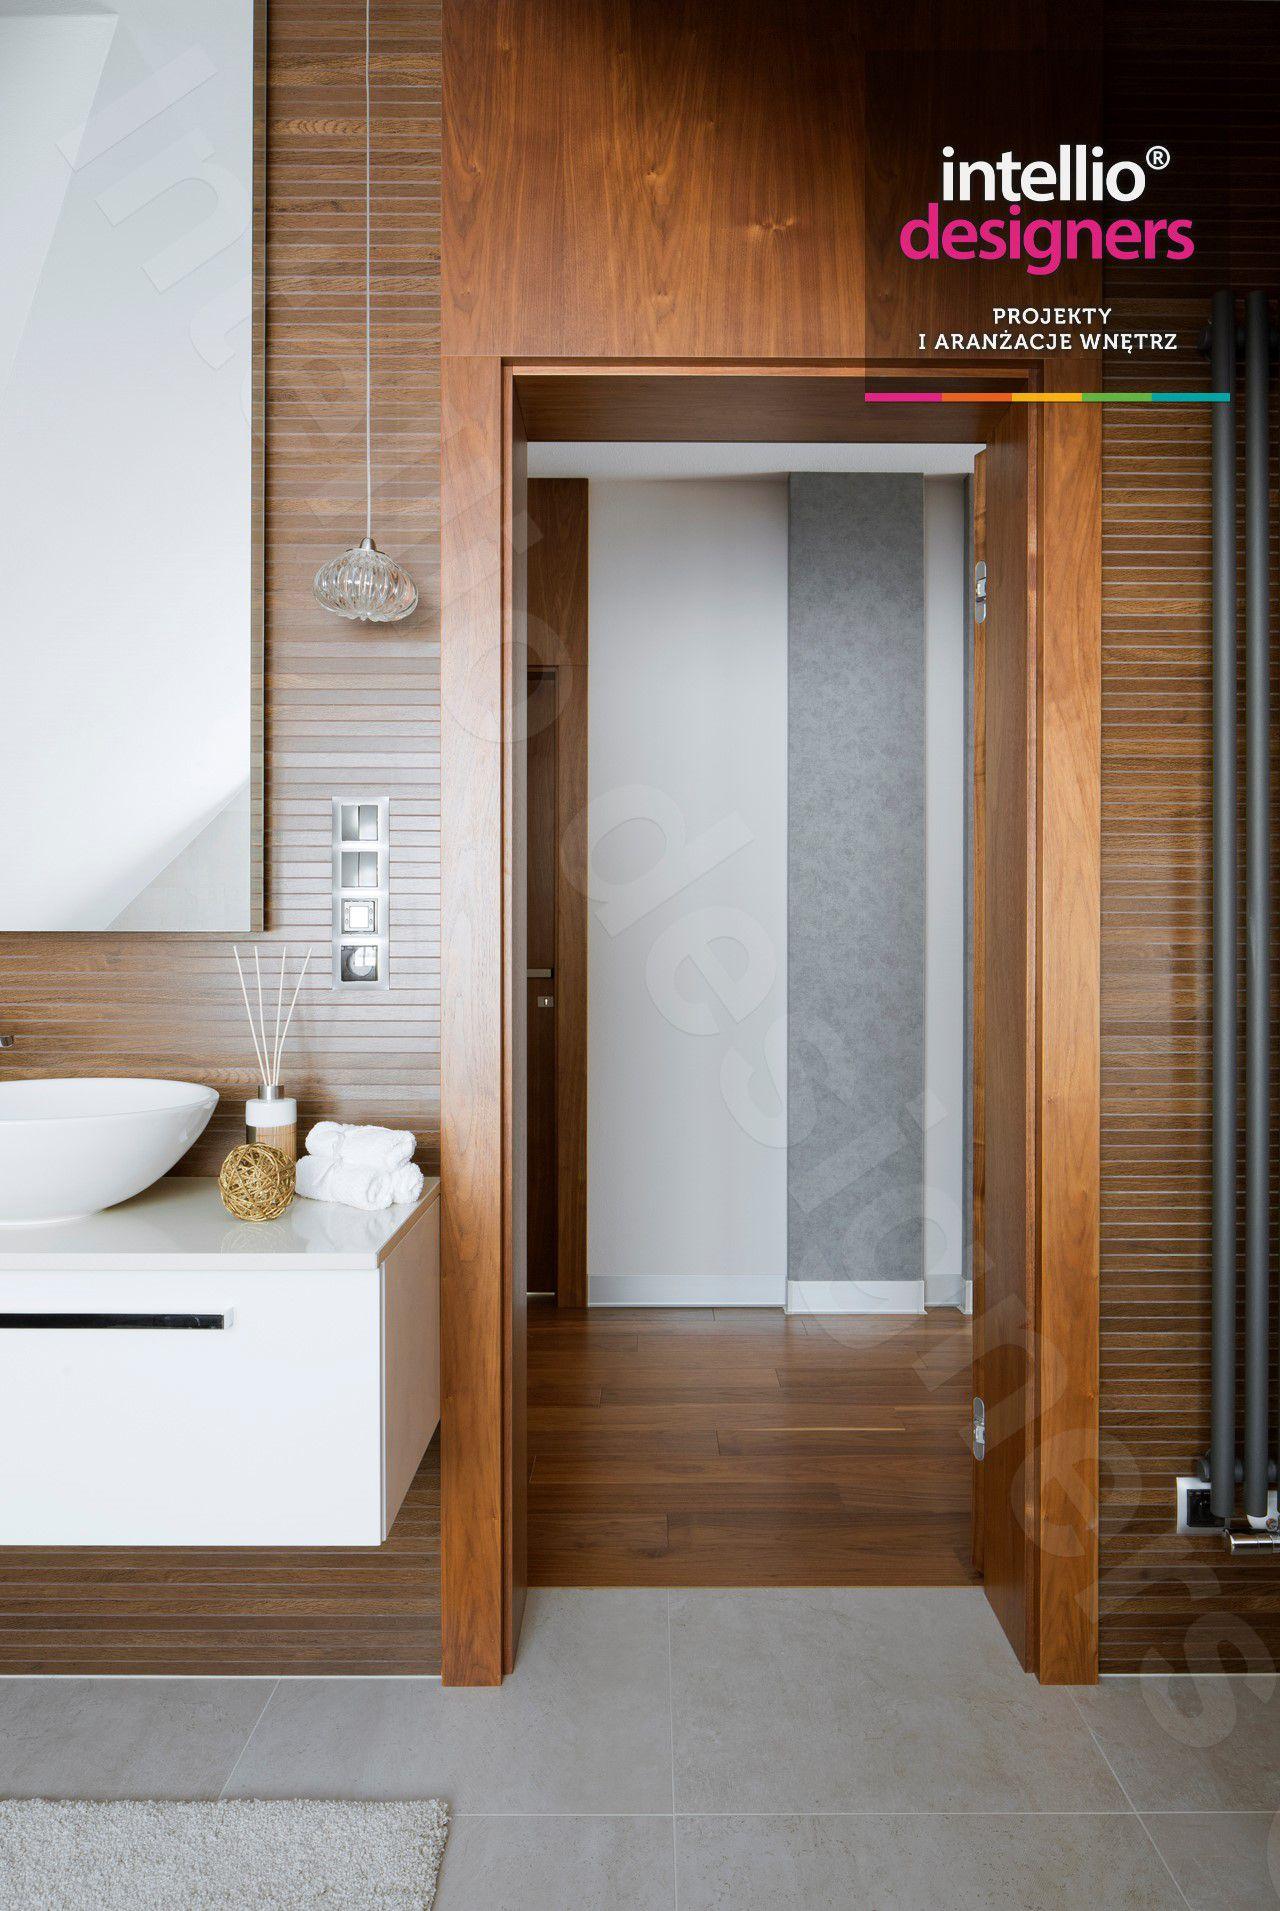 Intellio designers Cracow - arrangements and designs of modern interiors